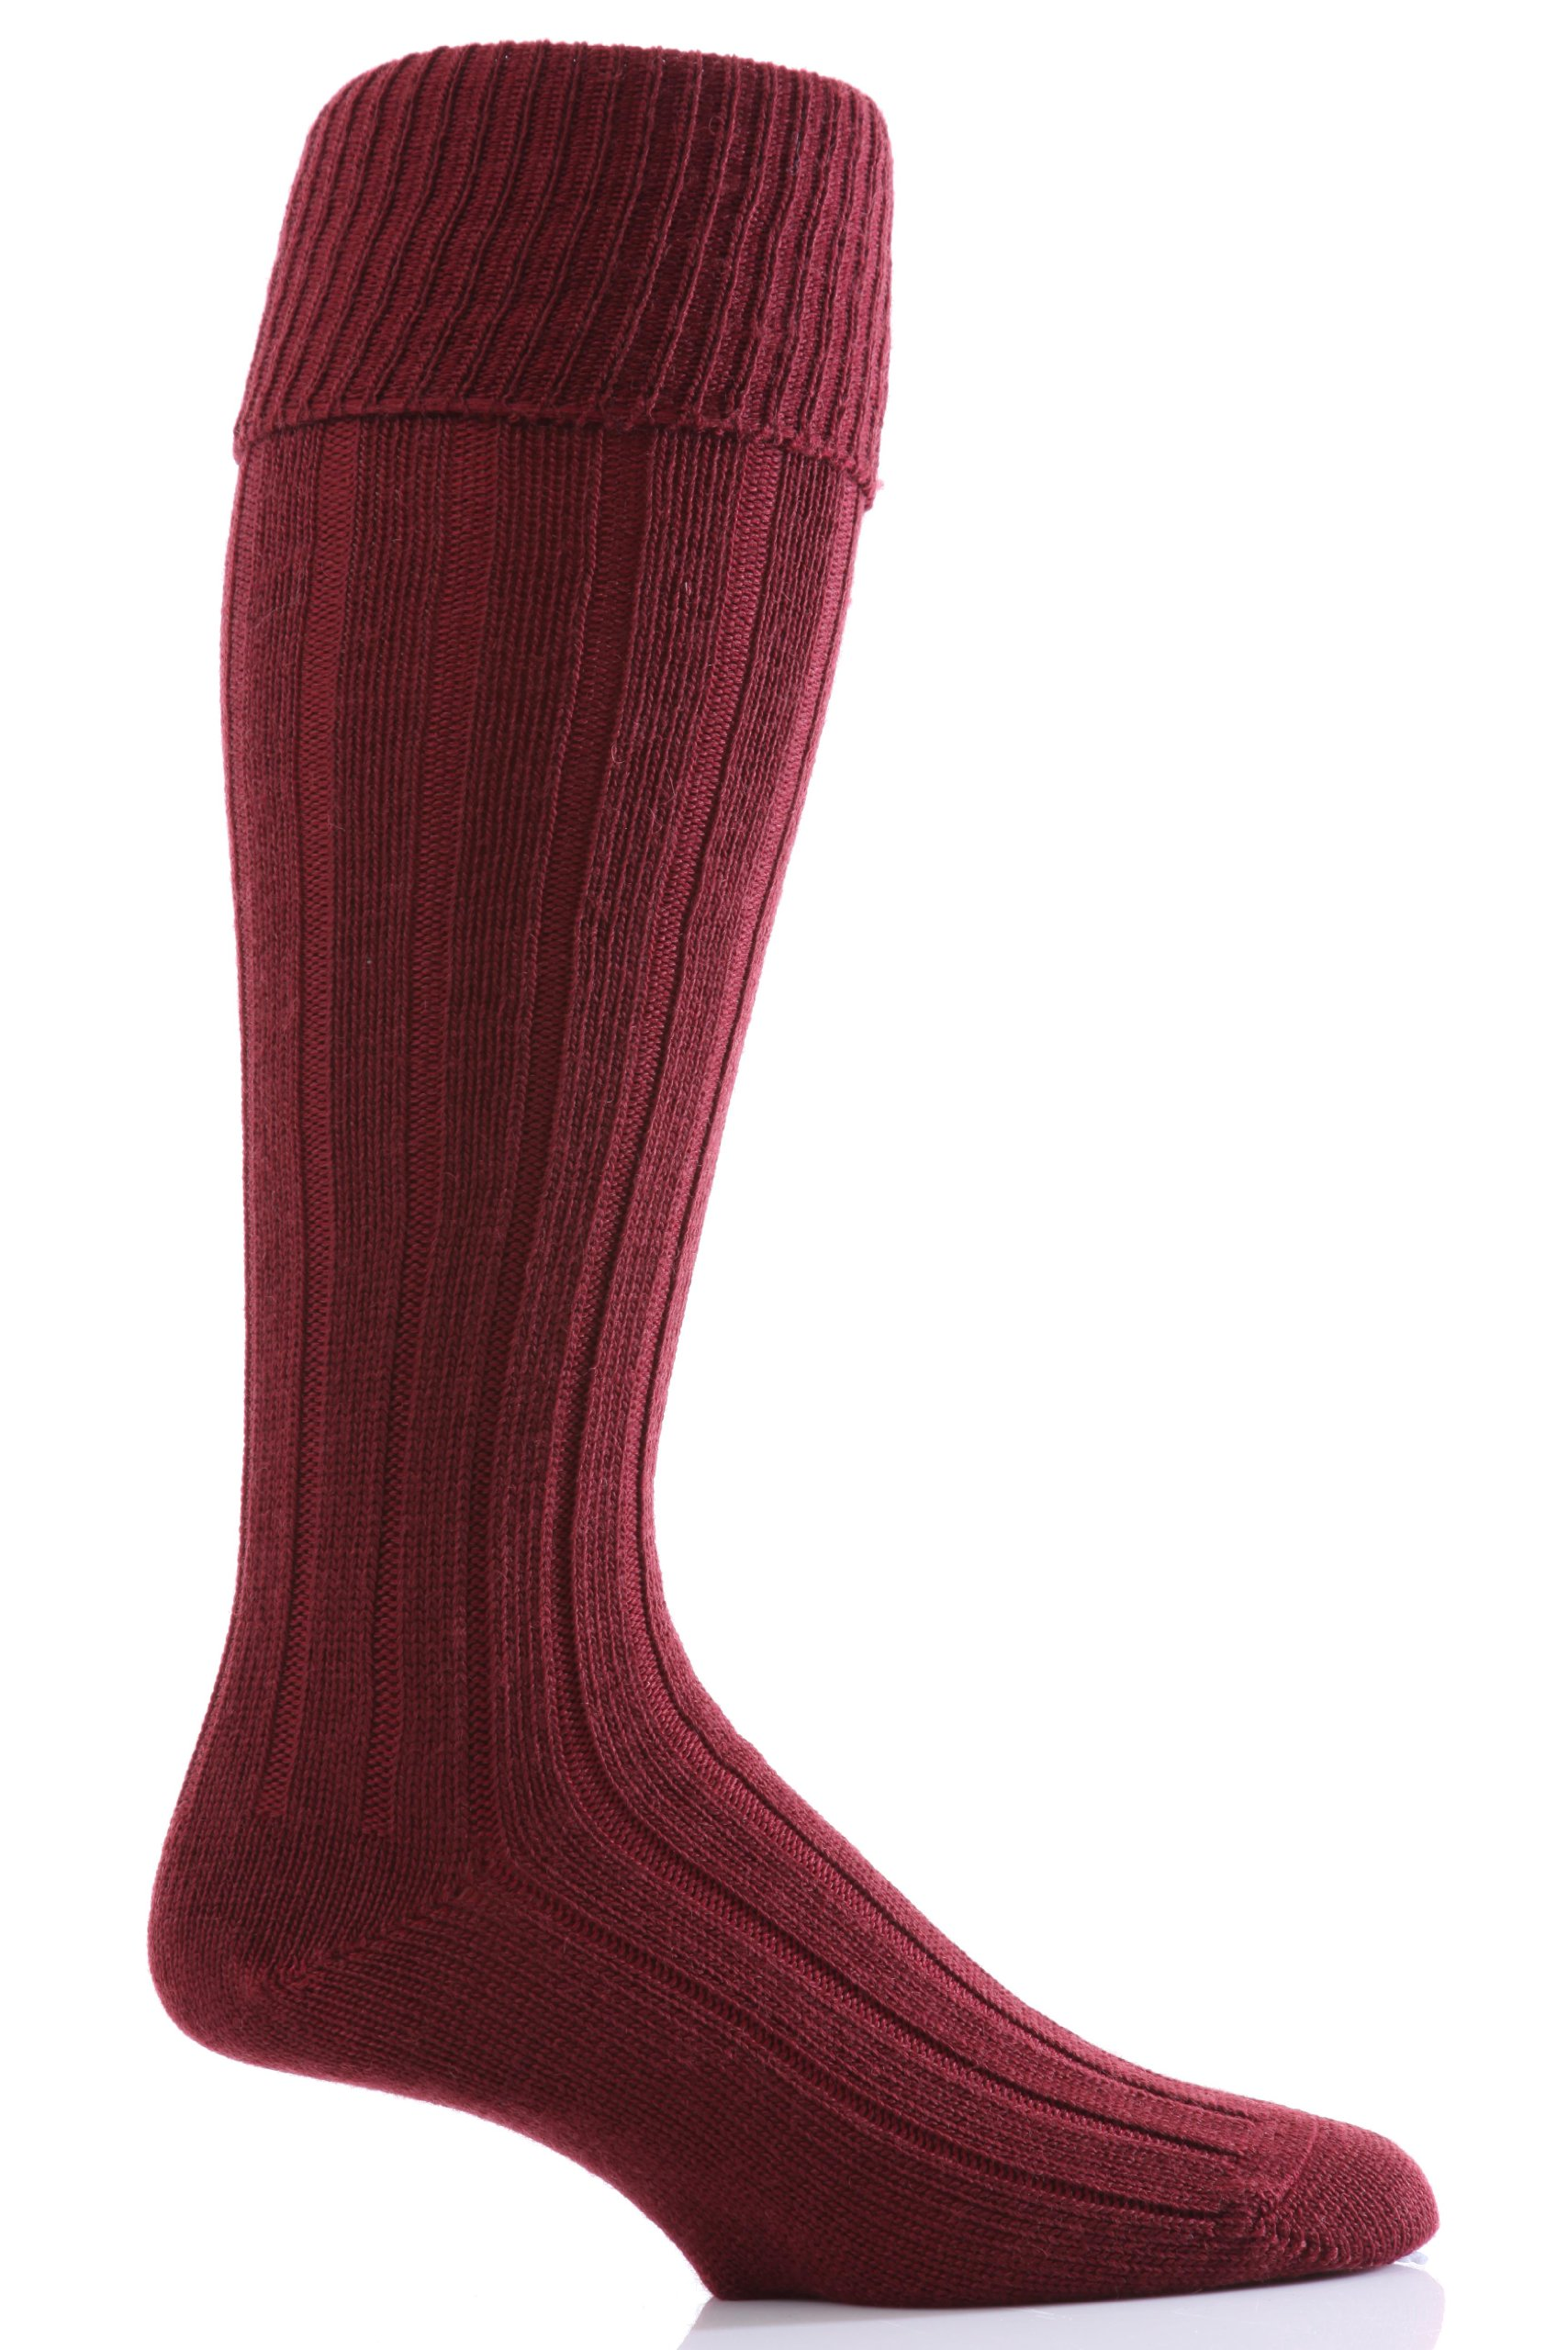 Glenmuir Men's 1 Pair Birkdale Golf Wool Knee High Socks with Turn Over Cuff 8-12 Burgundy by Glenmuir